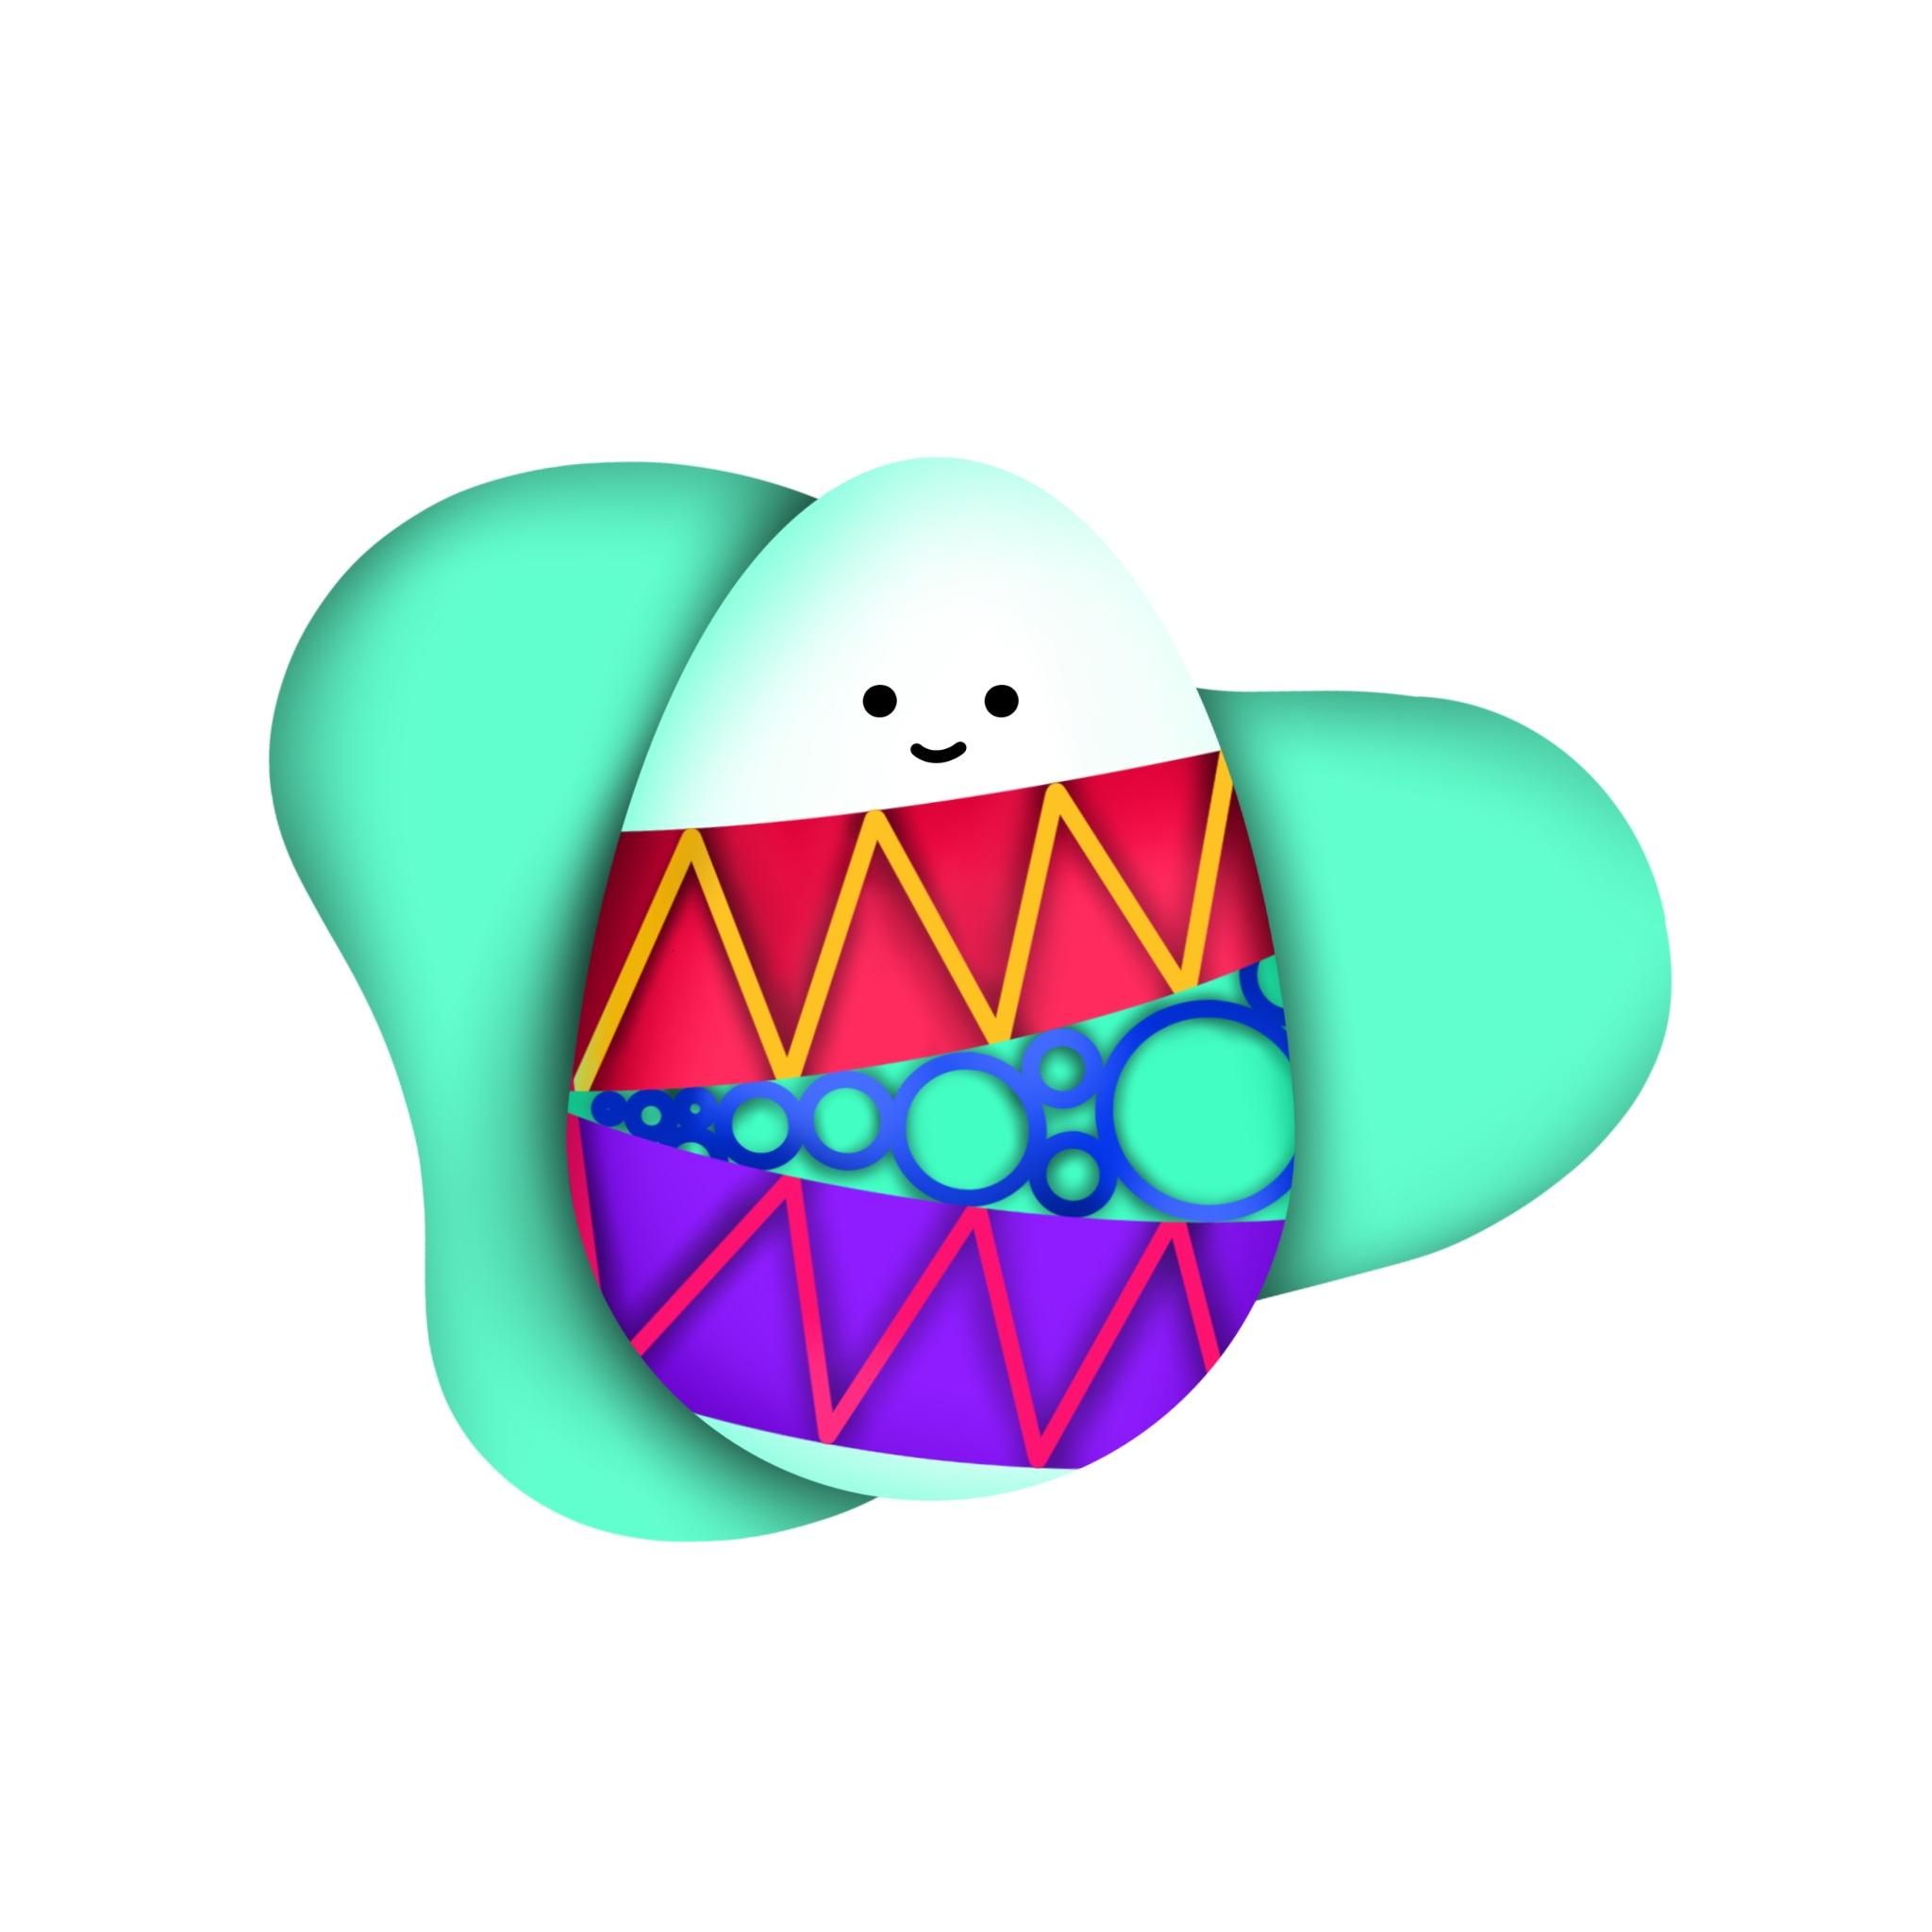 An illustration of a cute little egg.